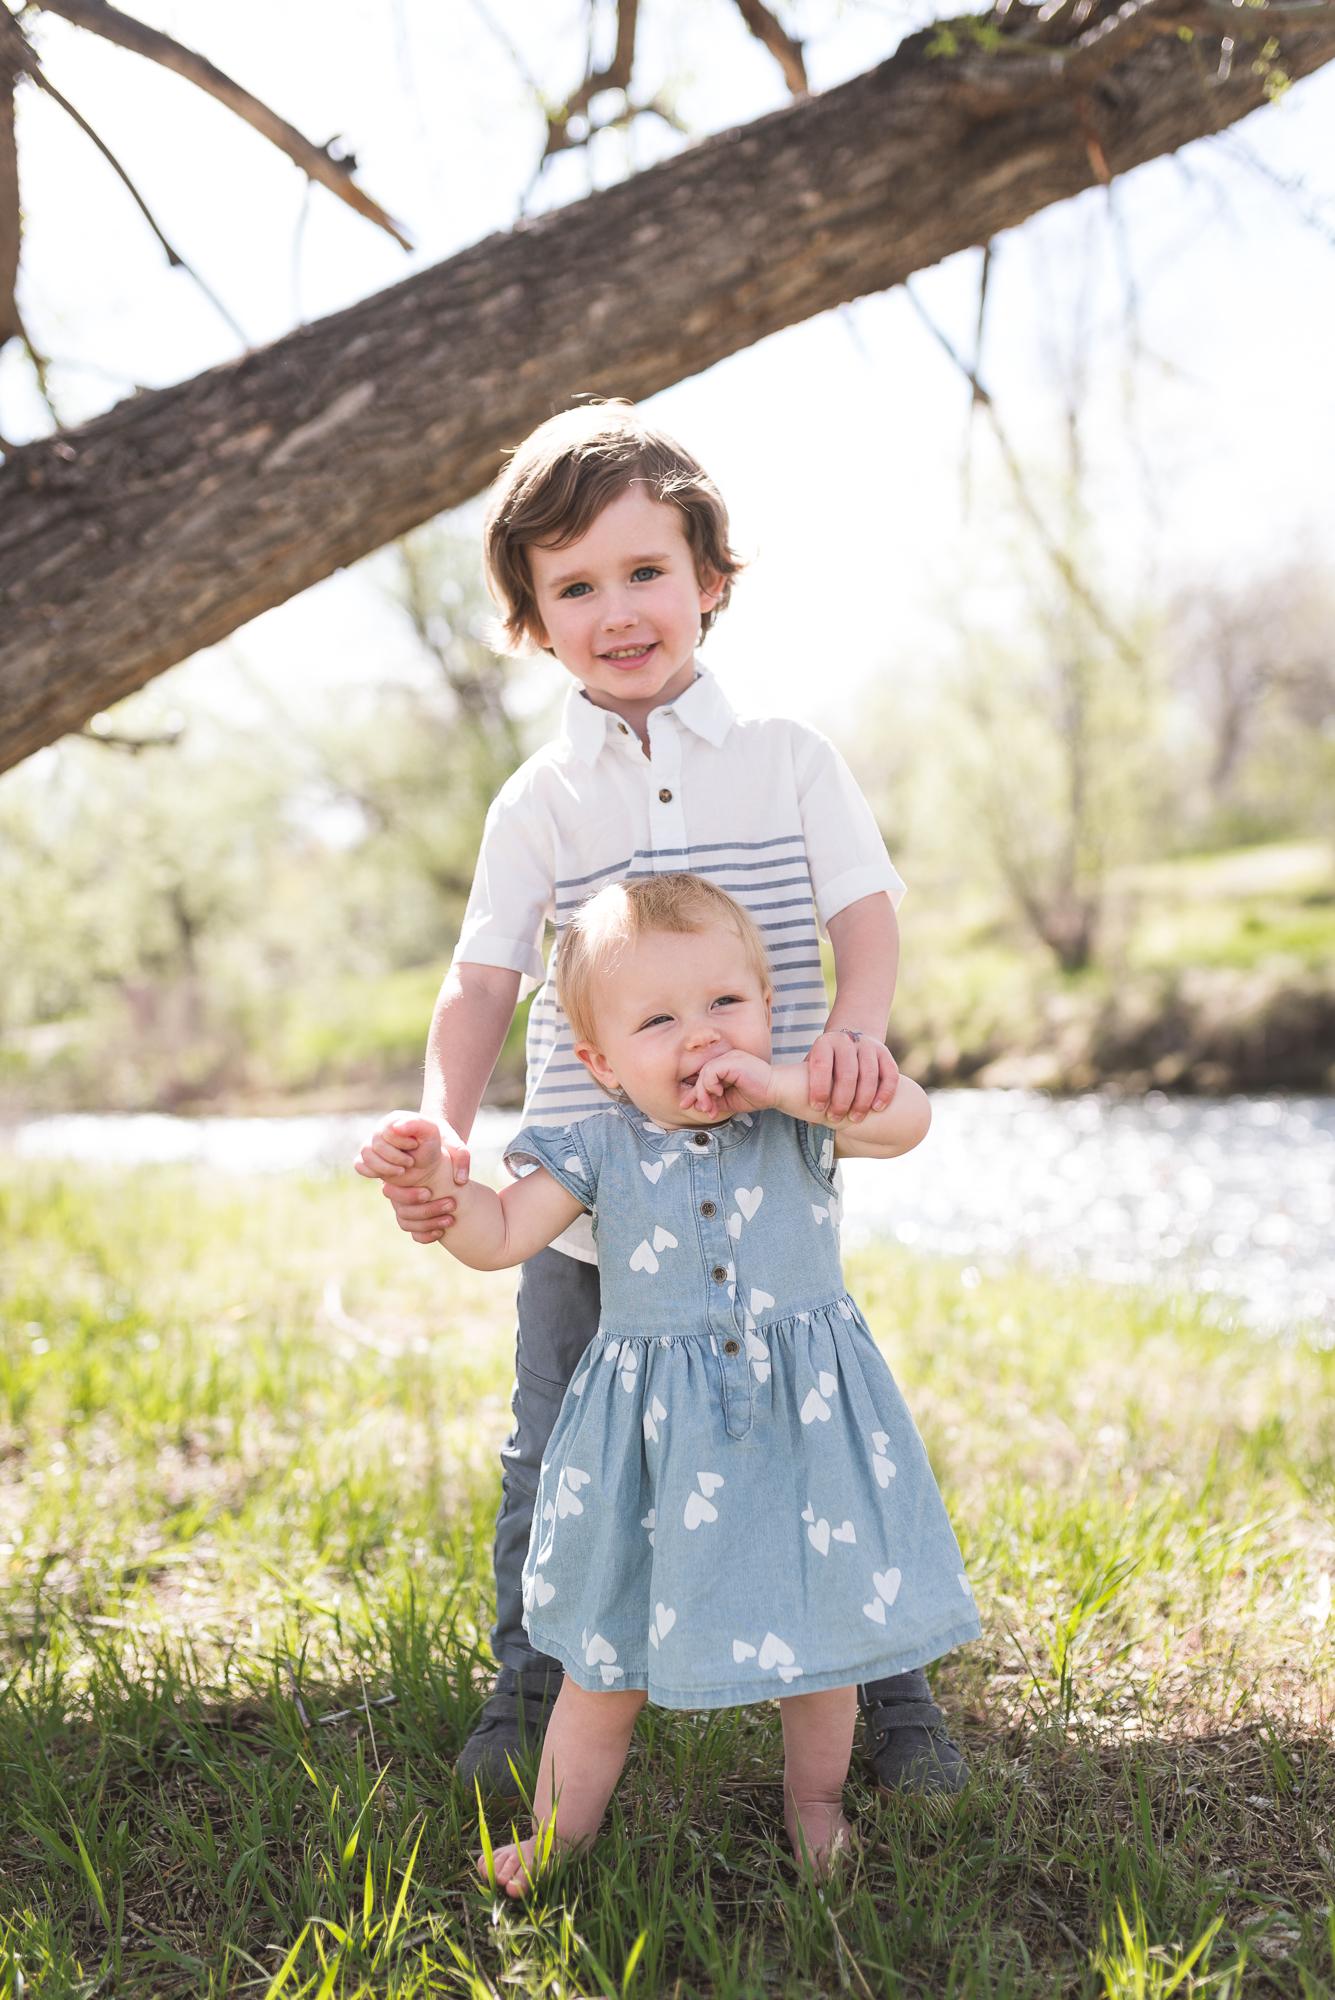 Denver+Boulder+Lifestyle+Family+Photographer+MiniSessions+JennyFolmanPhotography-1.jpg